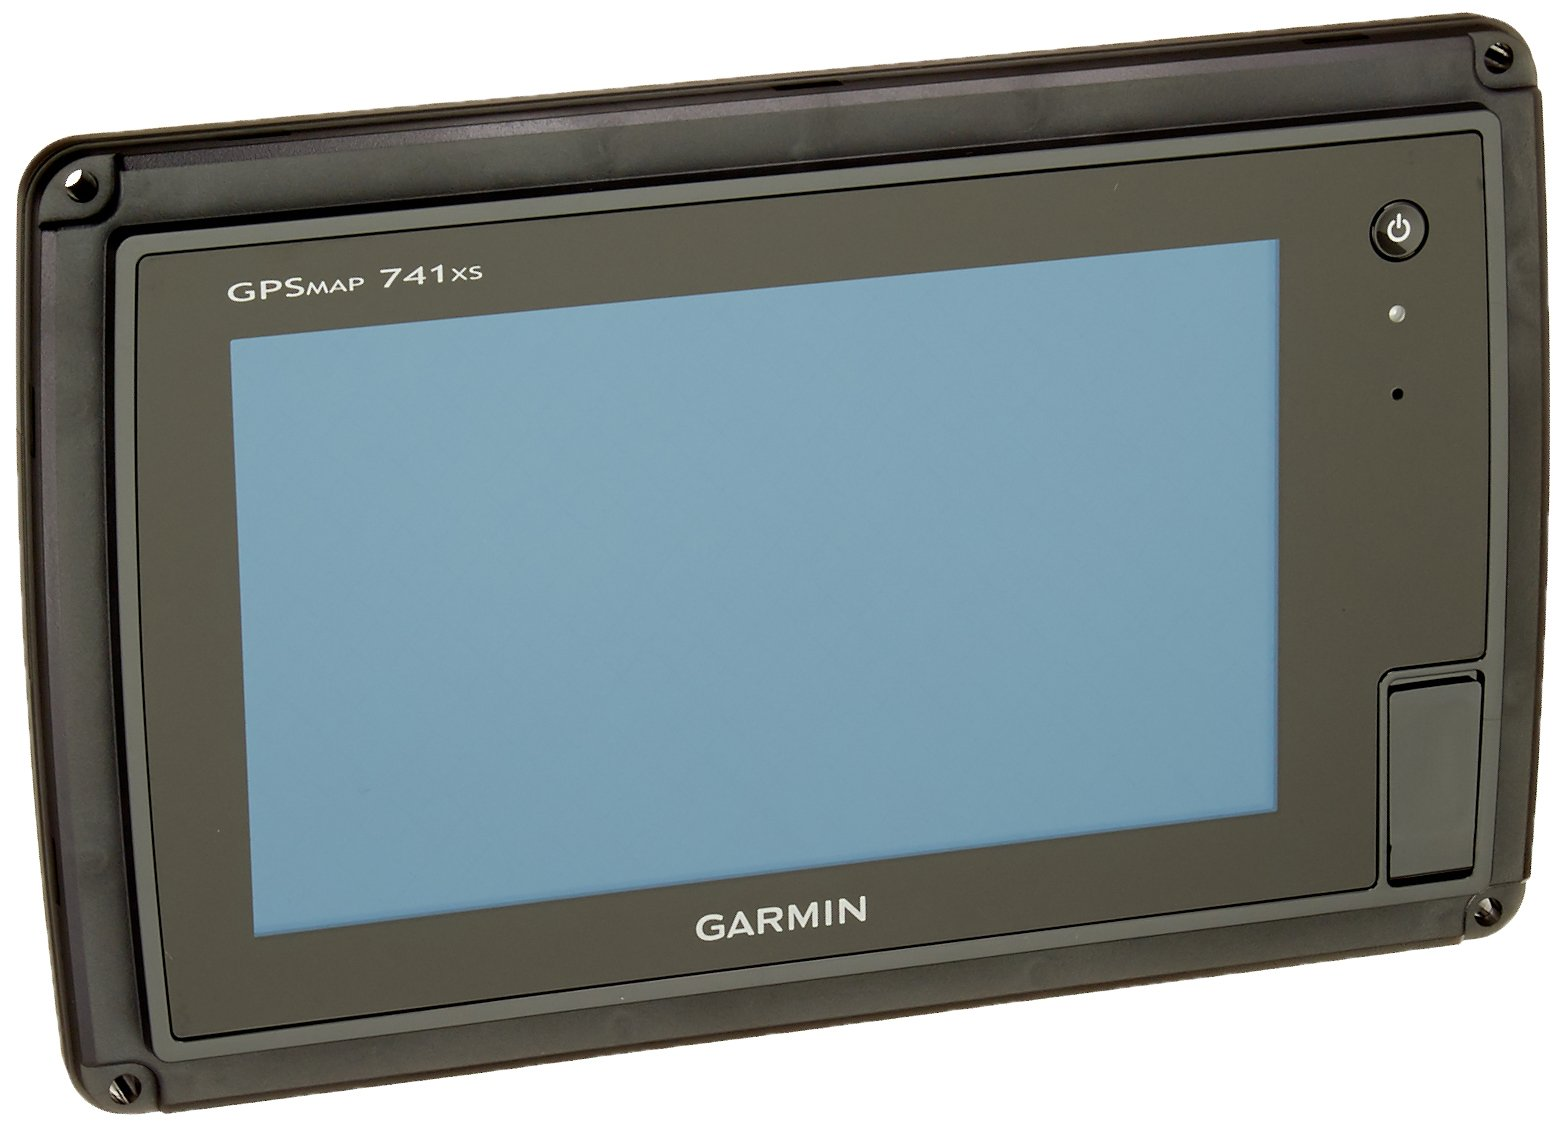 Garmin GPSMAP 741xs without Transducer Includes Worldwide Base